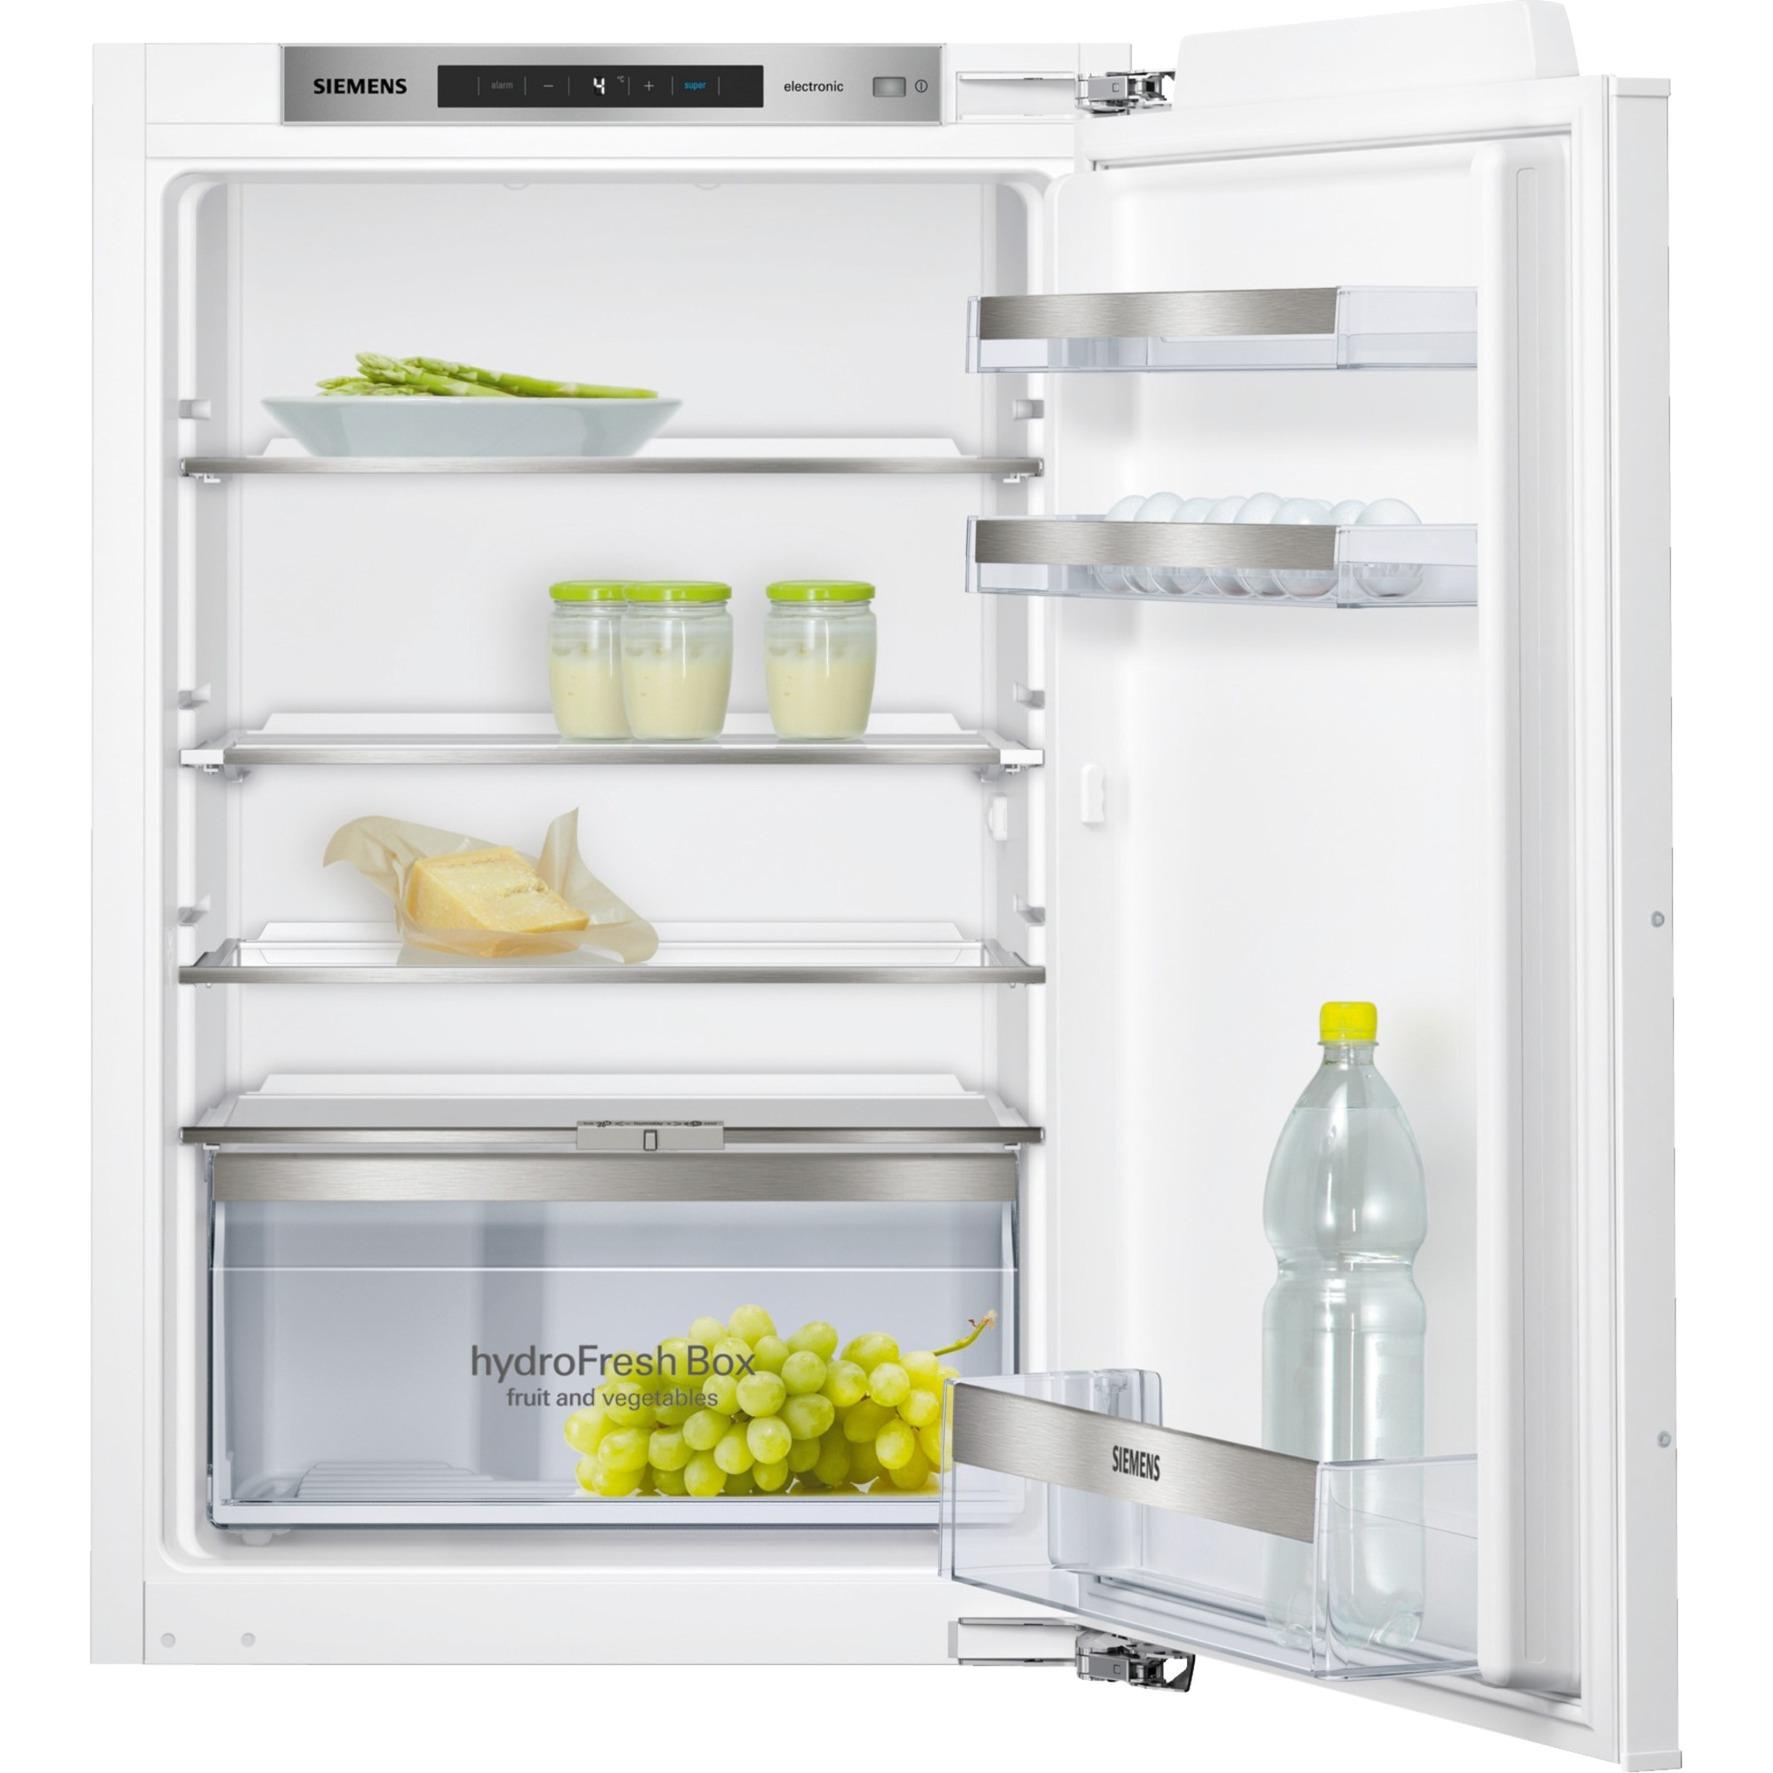 Siemens KI21RAF40, Kühlschrank weiß